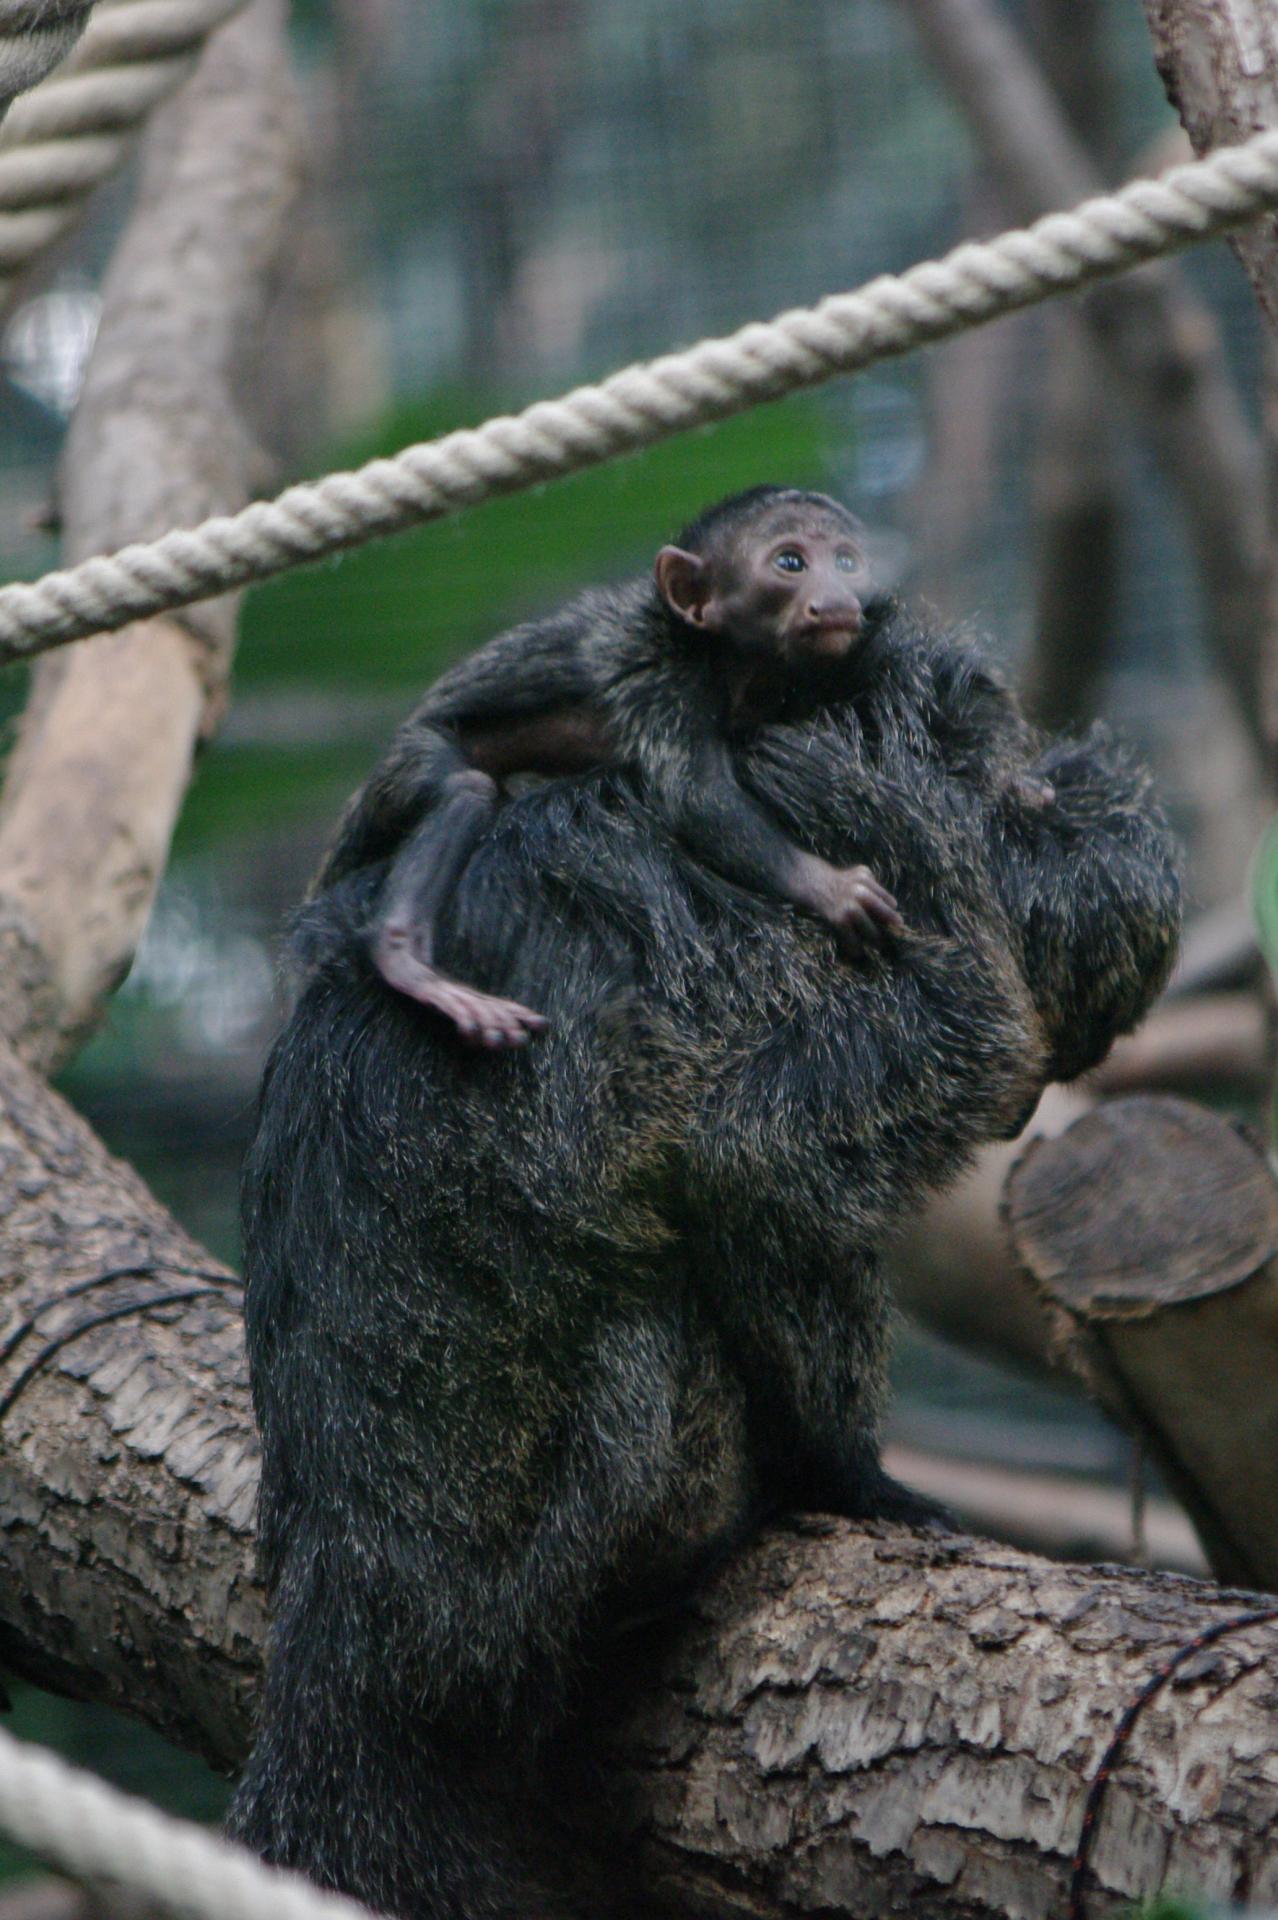 16 zone guyane serre tropicale adorable bebe accroche a sa mere